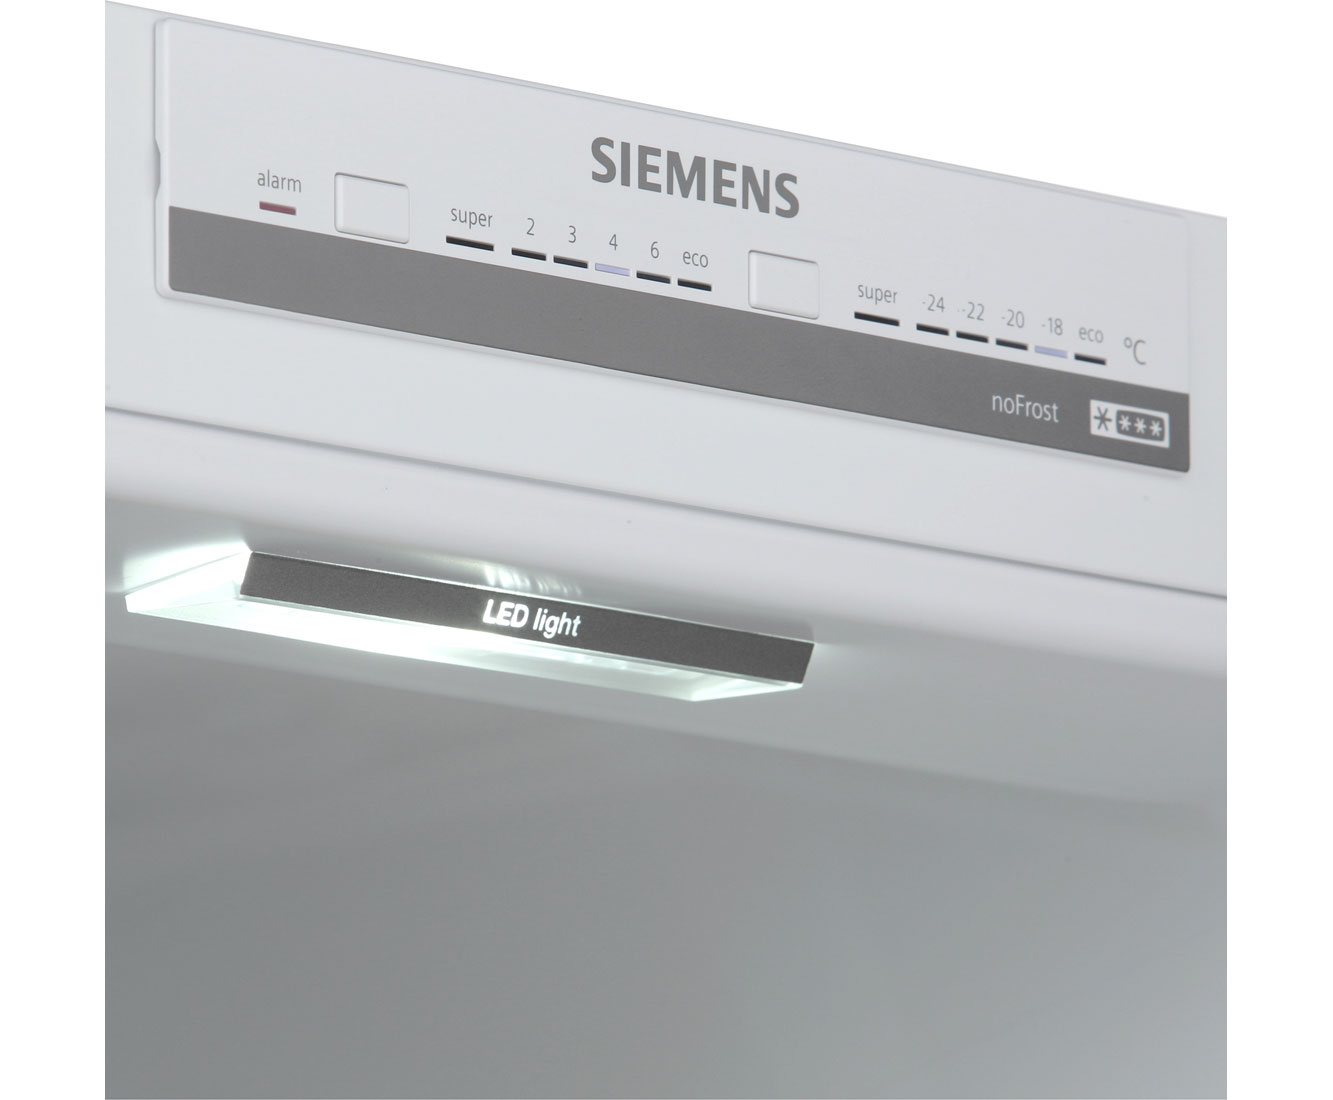 Siemens Kühlschrank Iq300 : Siemens iq kg nvl kühl gefrierkombination mit no frost